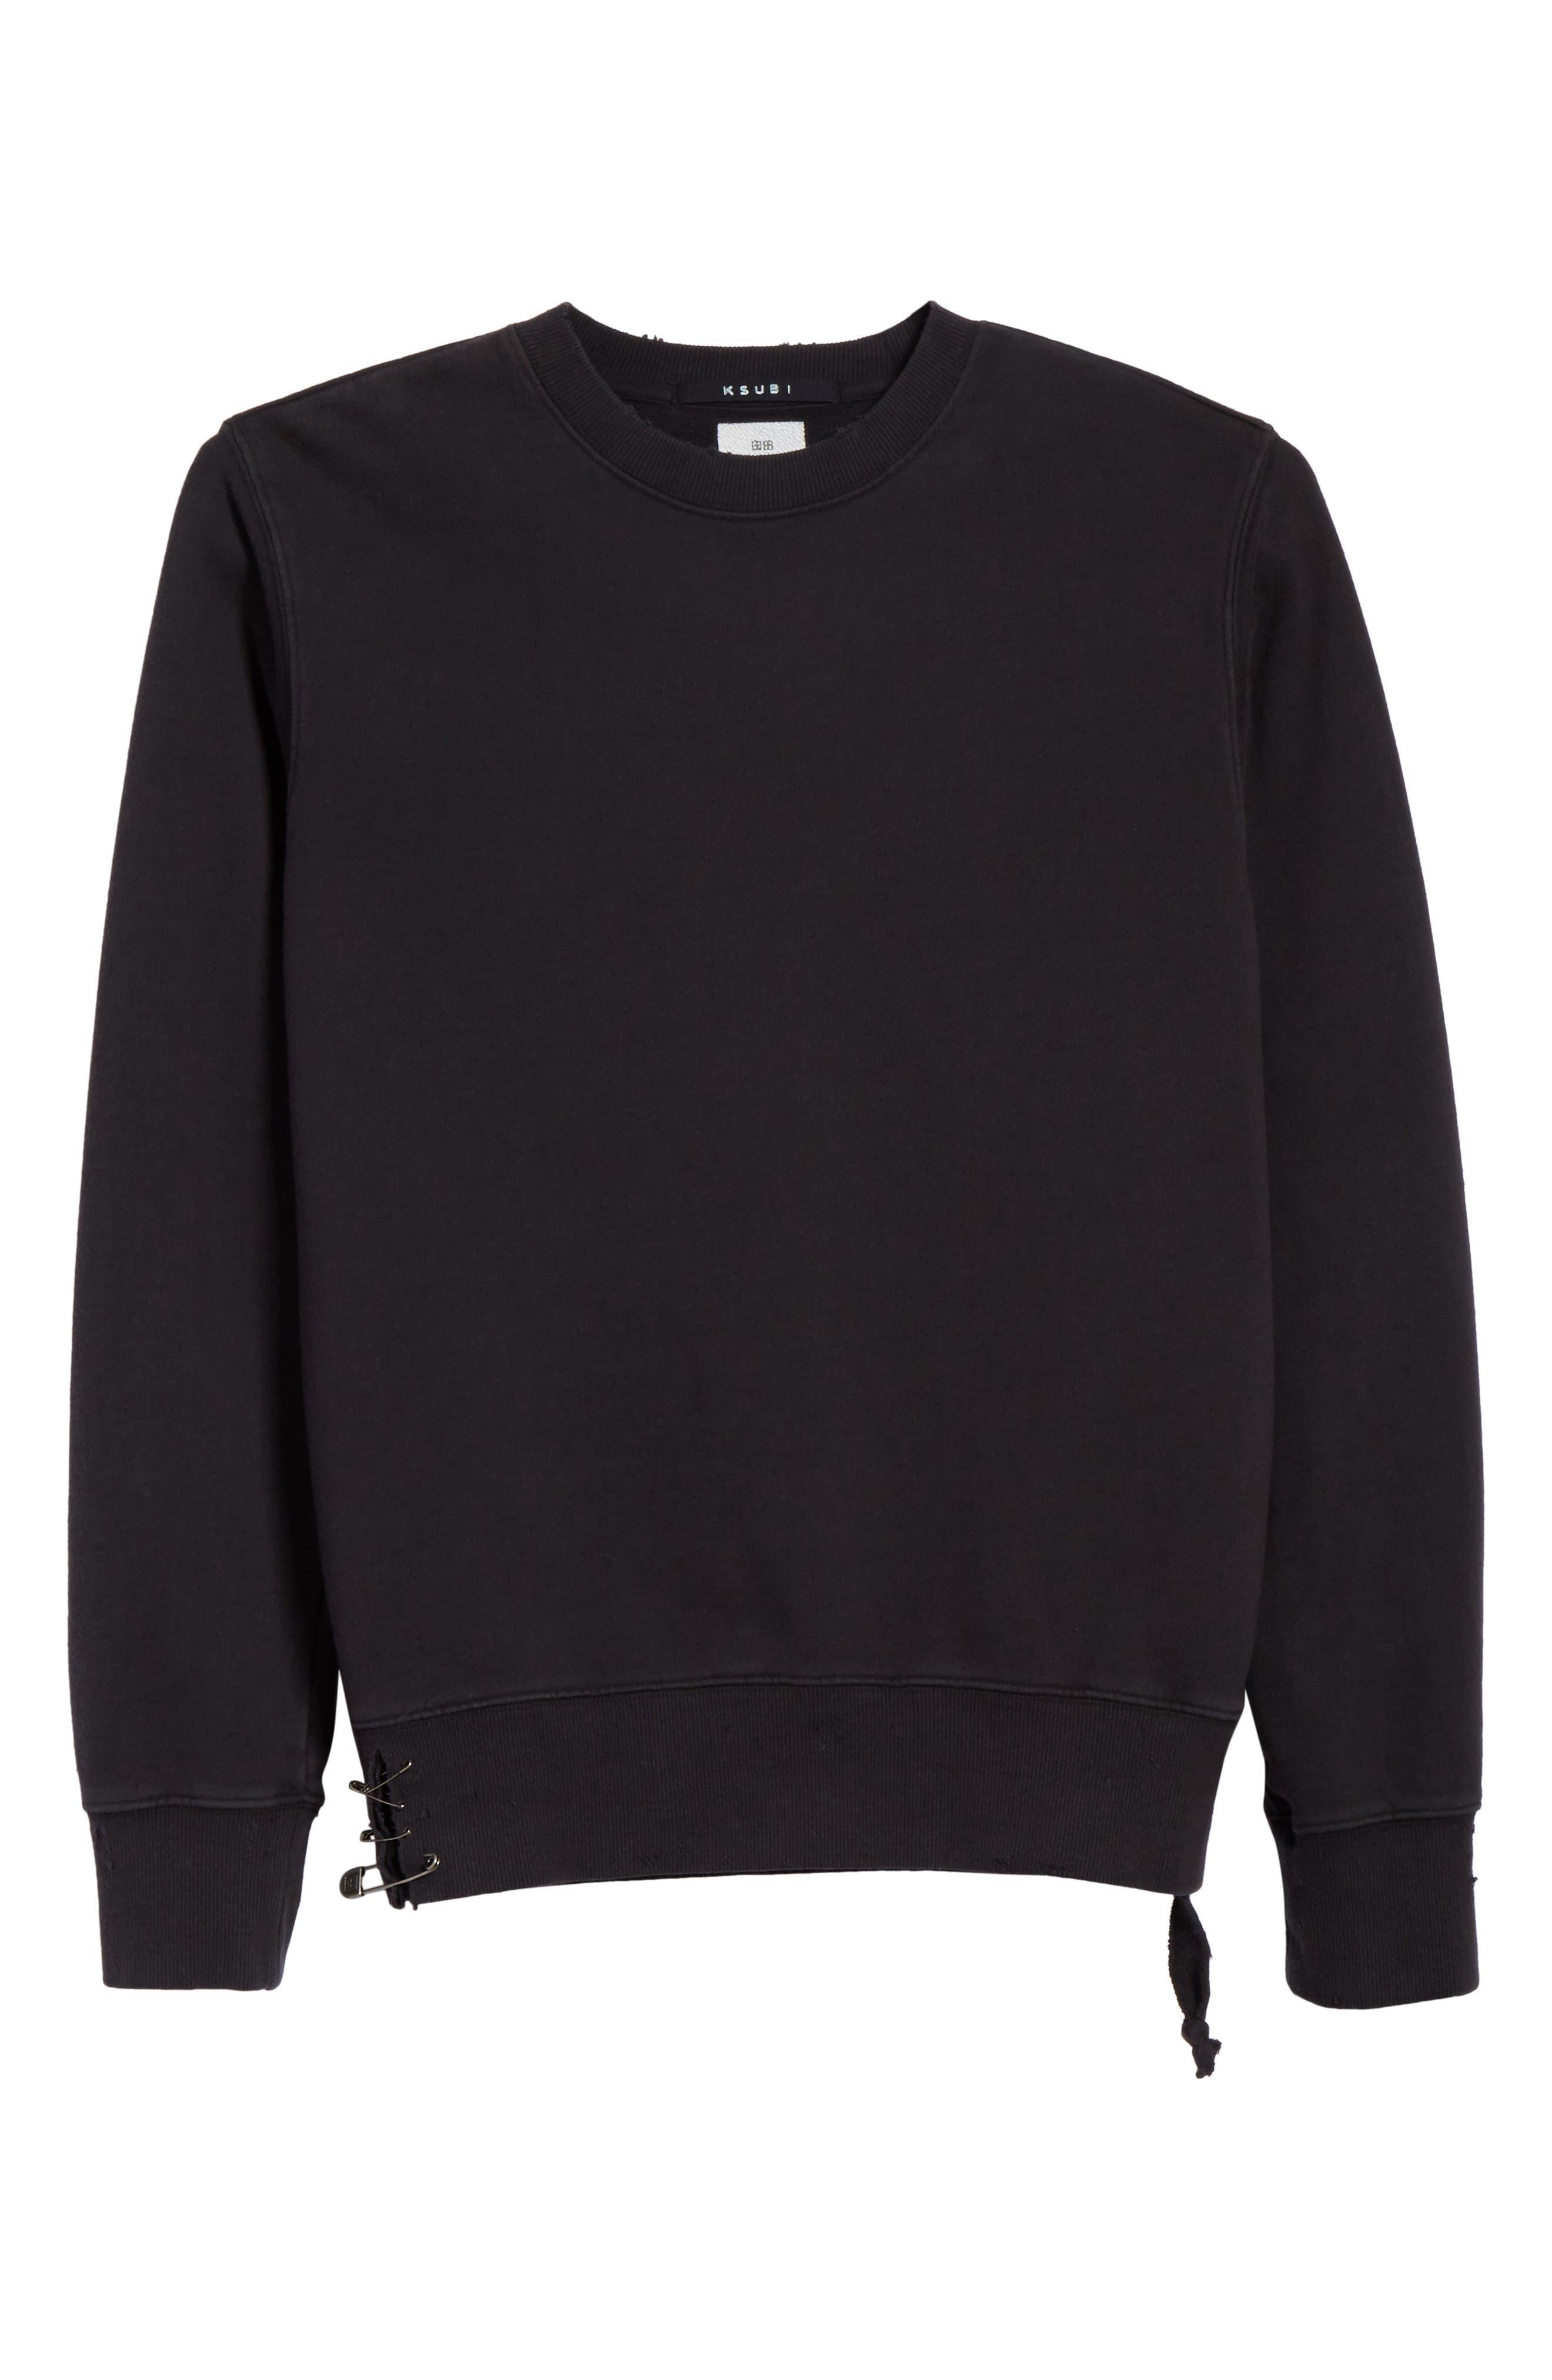 Pins Distressed Sweatshirt,                             Alternate thumbnail 6, color,                             Black